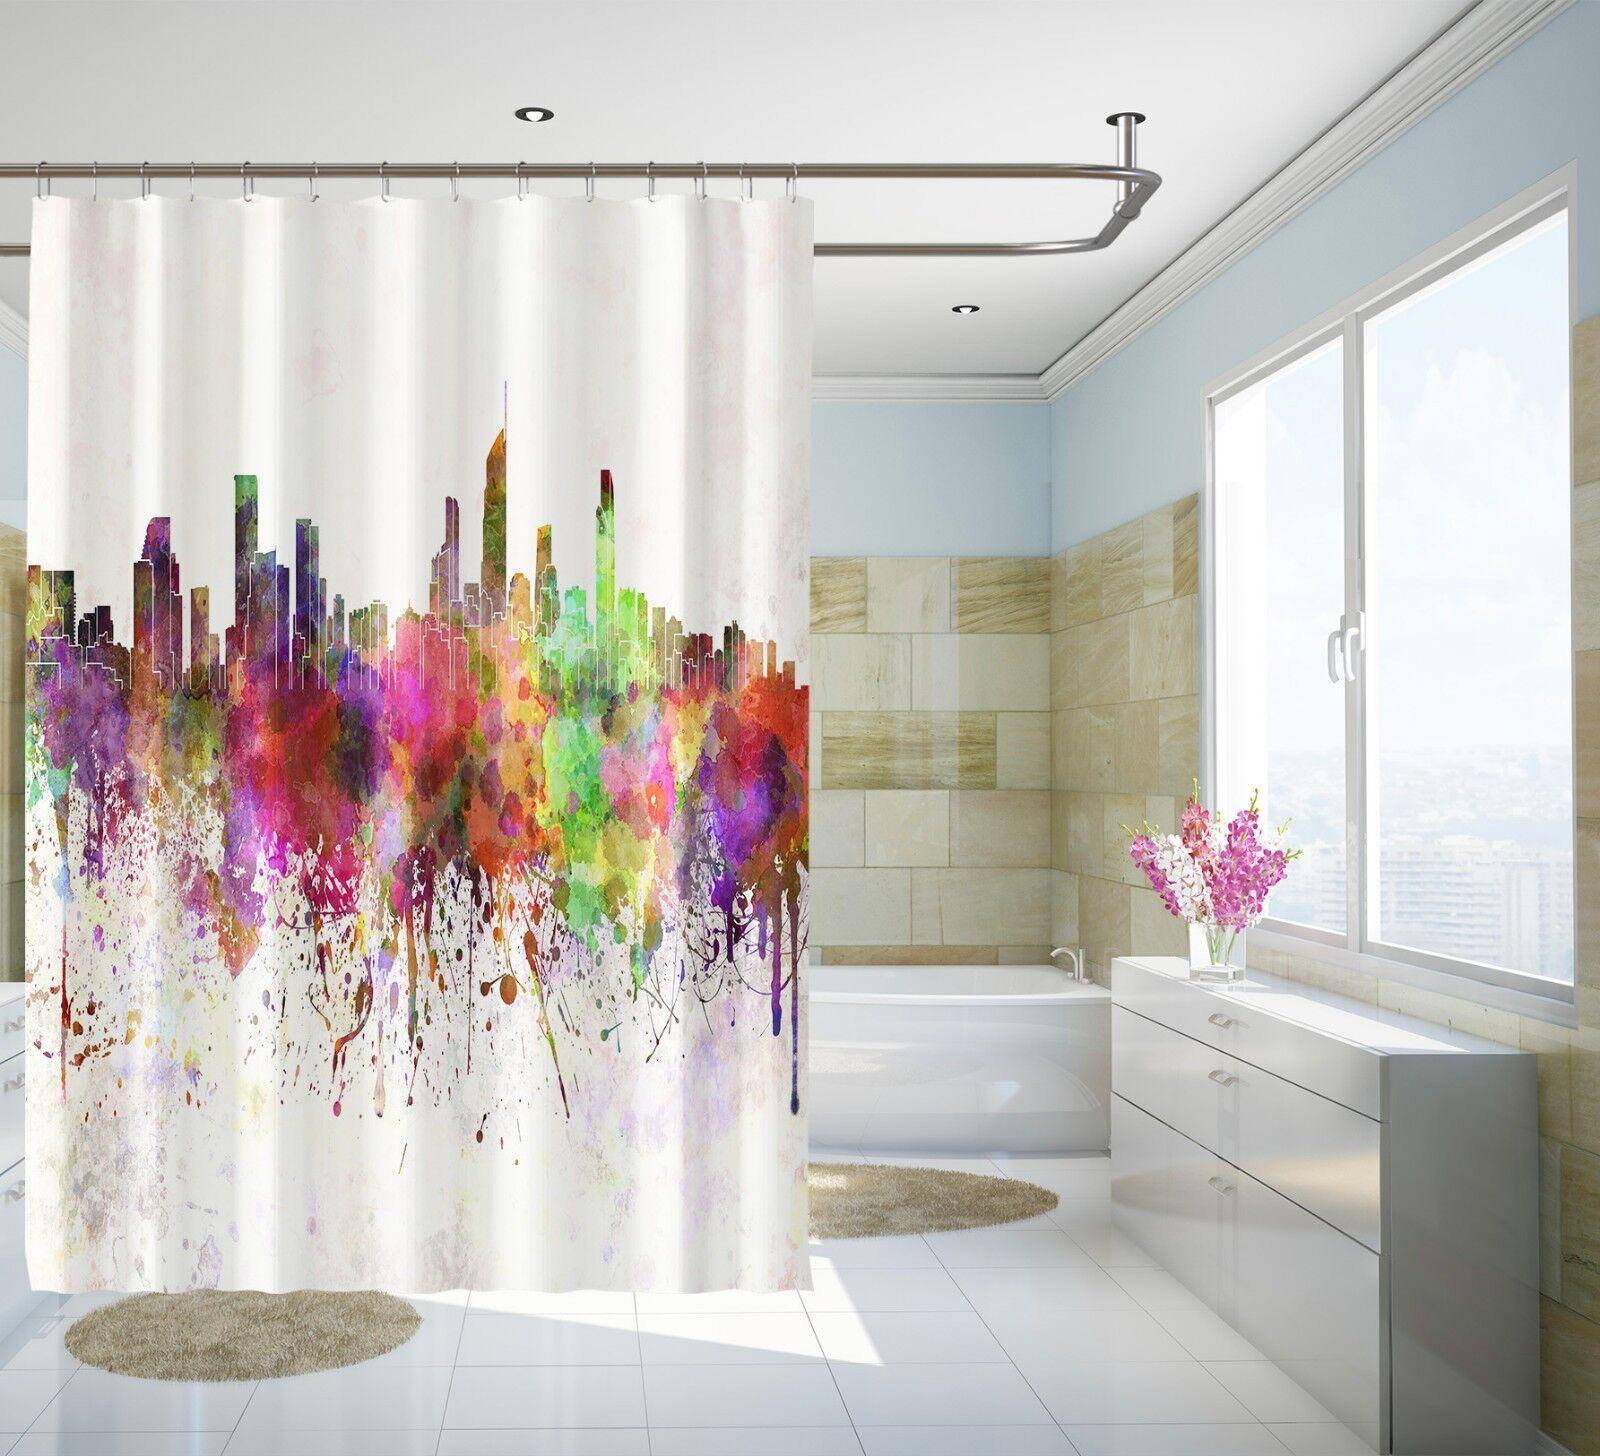 3D Stadt Graffiti 78 Duschvorhang Wasserdicht Faser Bad Daheim Windows Windows Windows Toilette 73537b